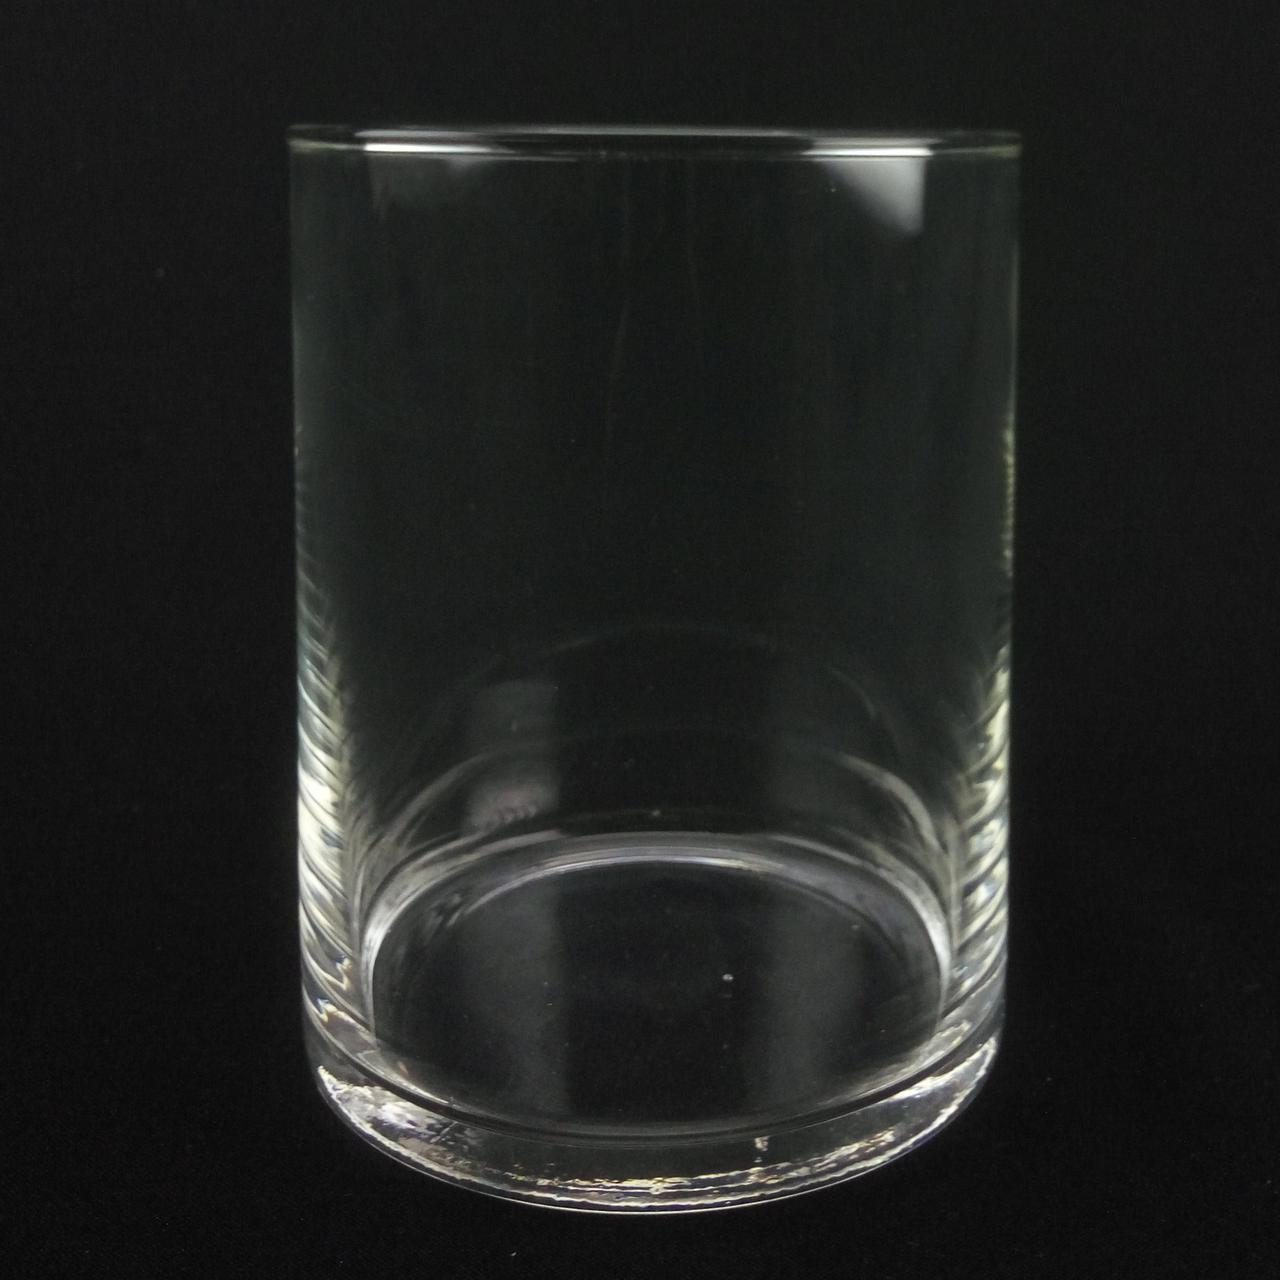 Подсвечник h 15 см, Ø 11 см, колба